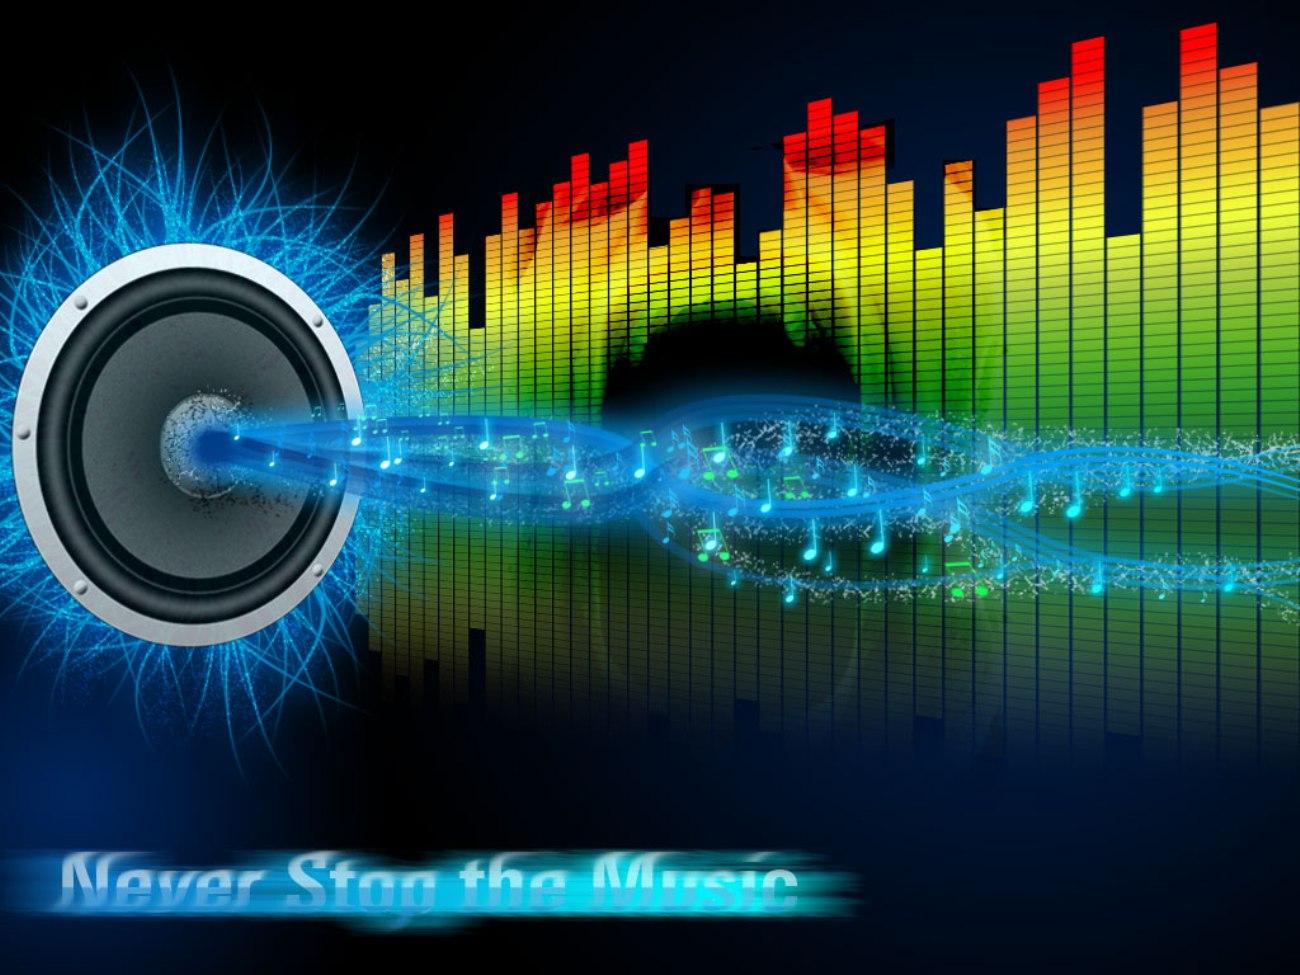 http://3.bp.blogspot.com/_5D4O5O51yBU/S_xB-dfG-CI/AAAAAAAAAWM/RCgONnJ-ICU/s1600/music-wallpaper.jpg